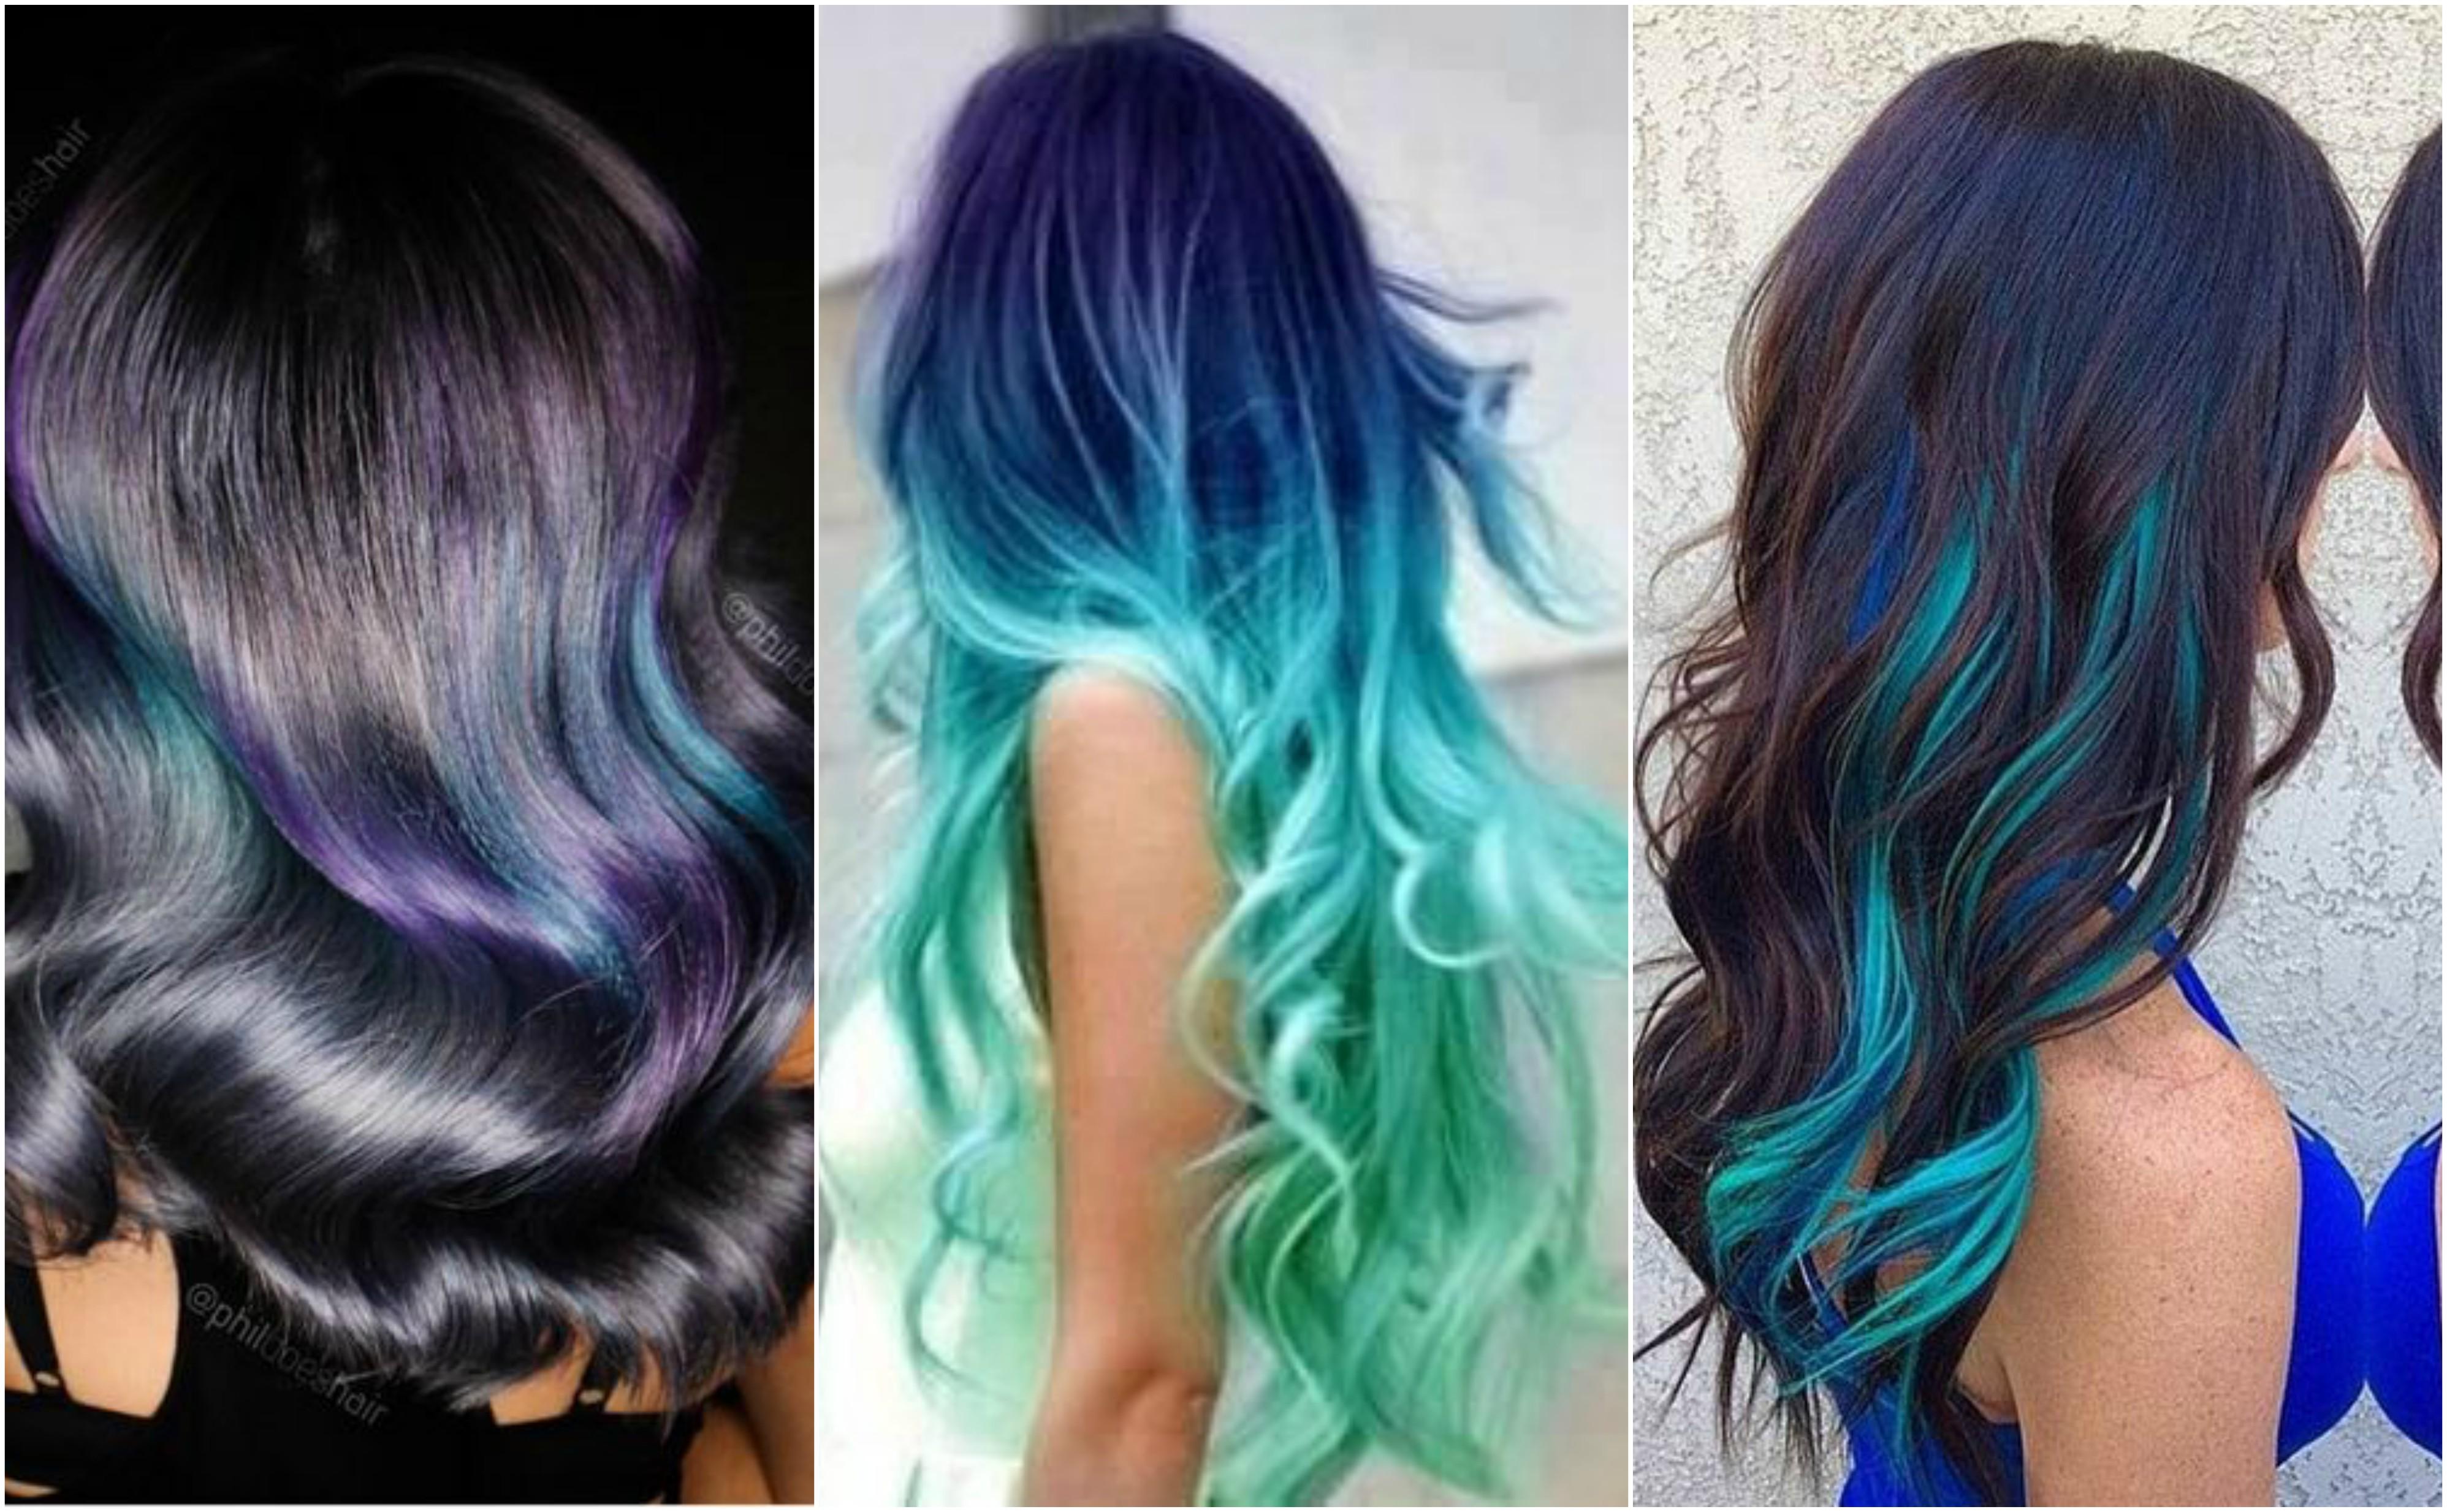 WTF is midnight mermaid hair?